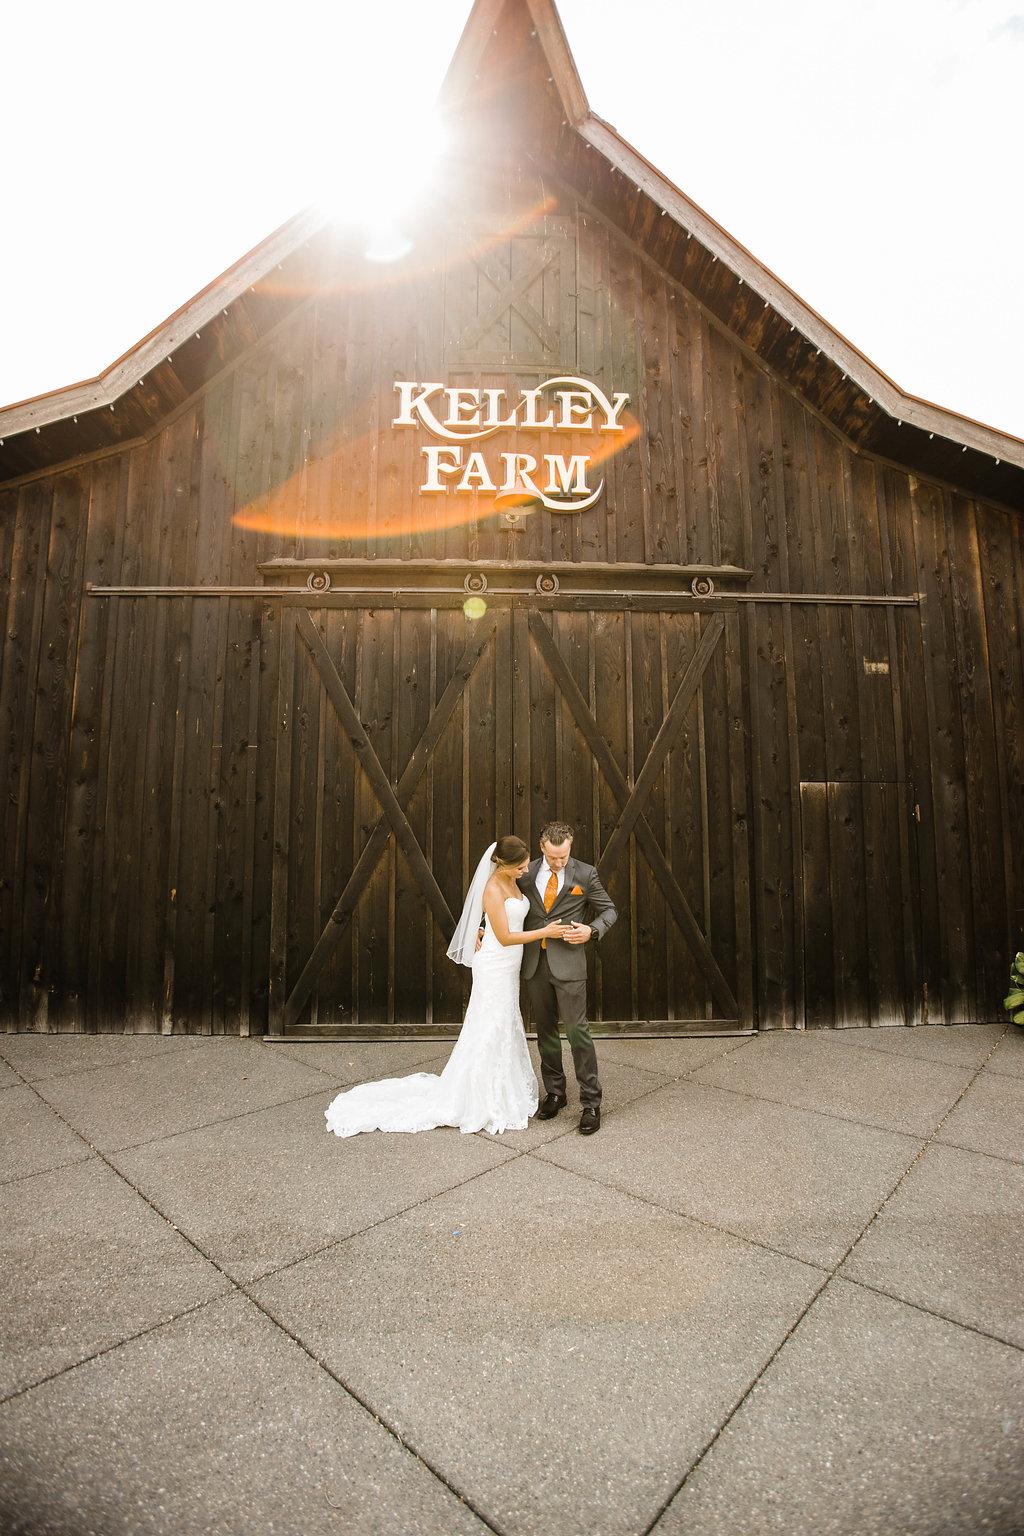 Erin+Tyson_Kelly_Farm_Wedding_Adina_Preston_Weddings_3.JPG